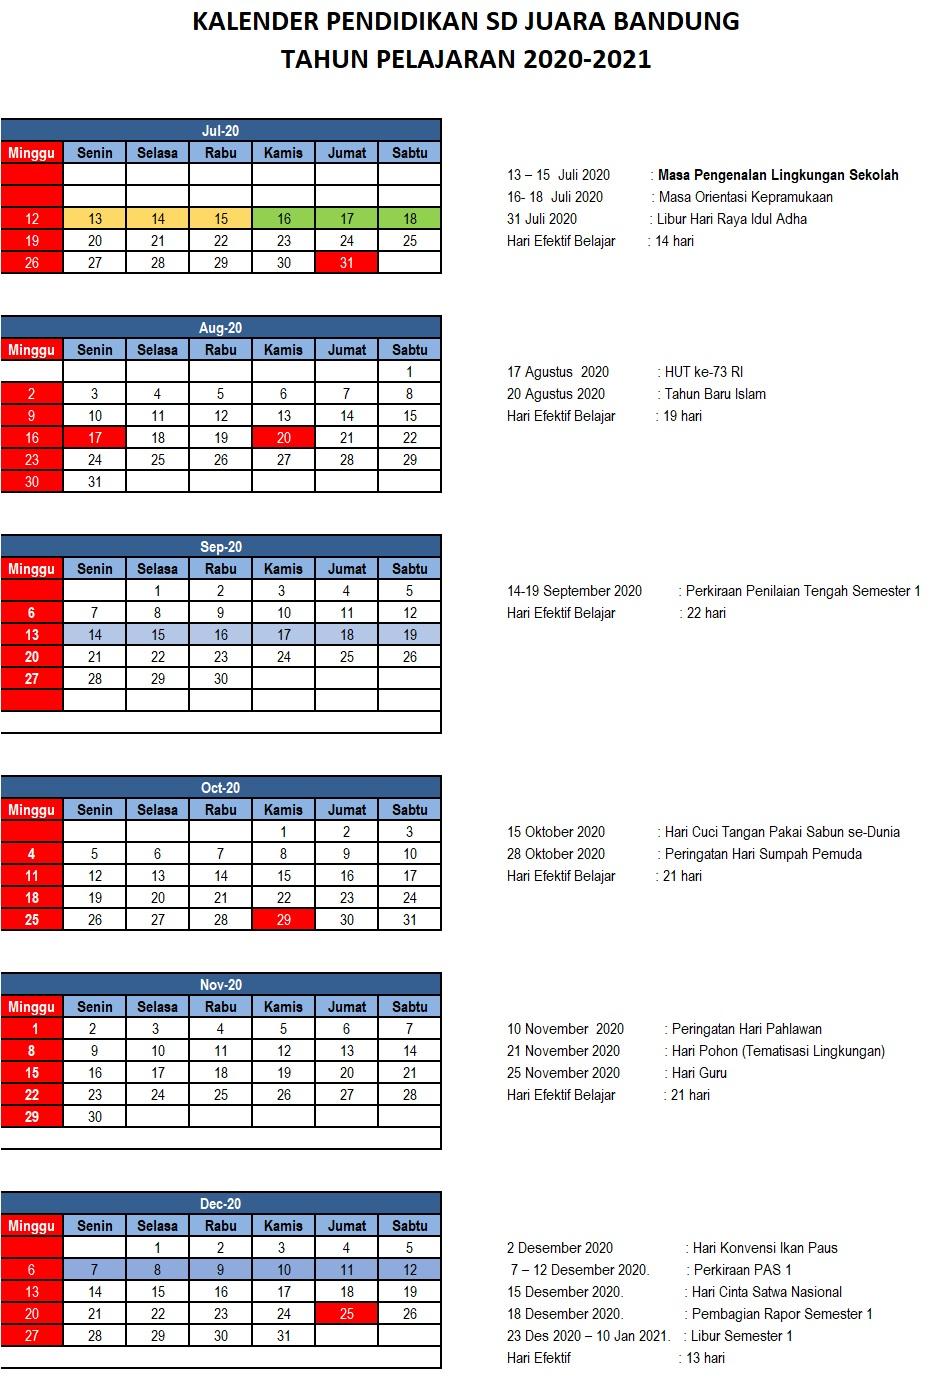 KALENDER AKADEMIK 2020-2021 - SD Juara Bandung